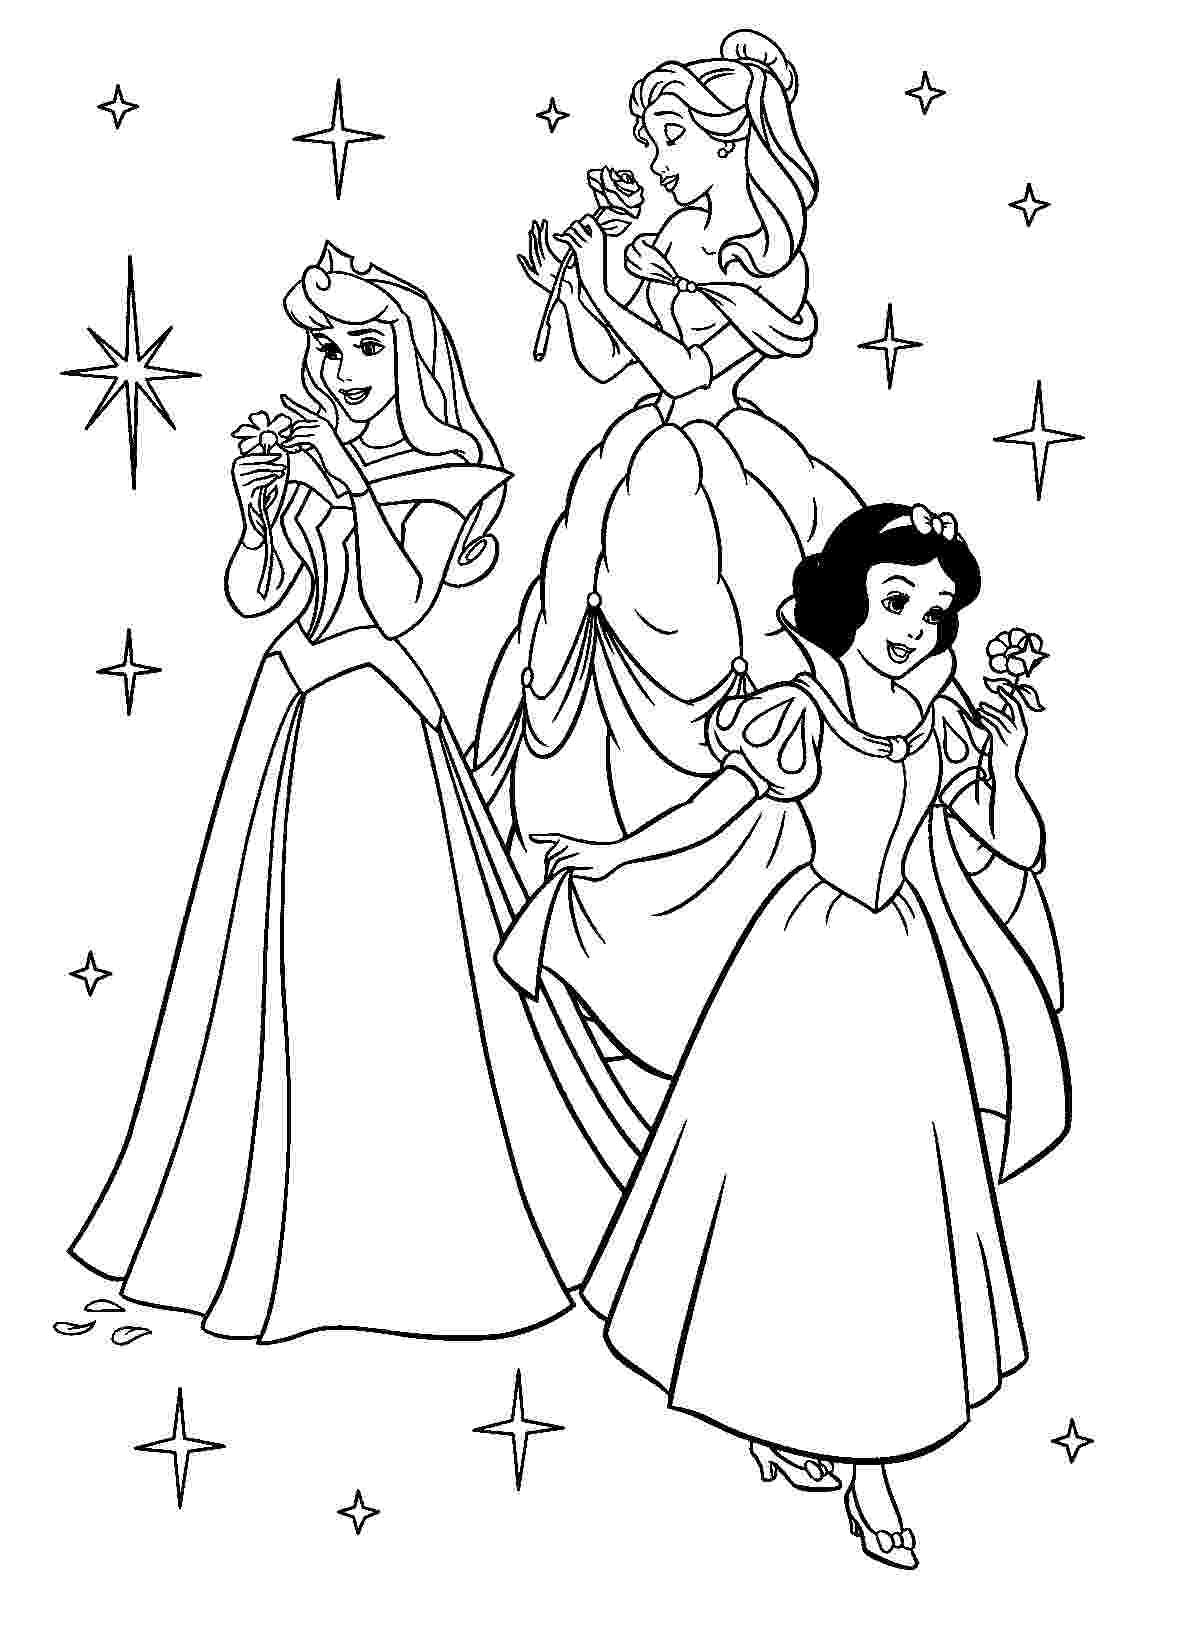 free disney princess coloring pages disney princess christmas coloring pages princess pages free coloring disney